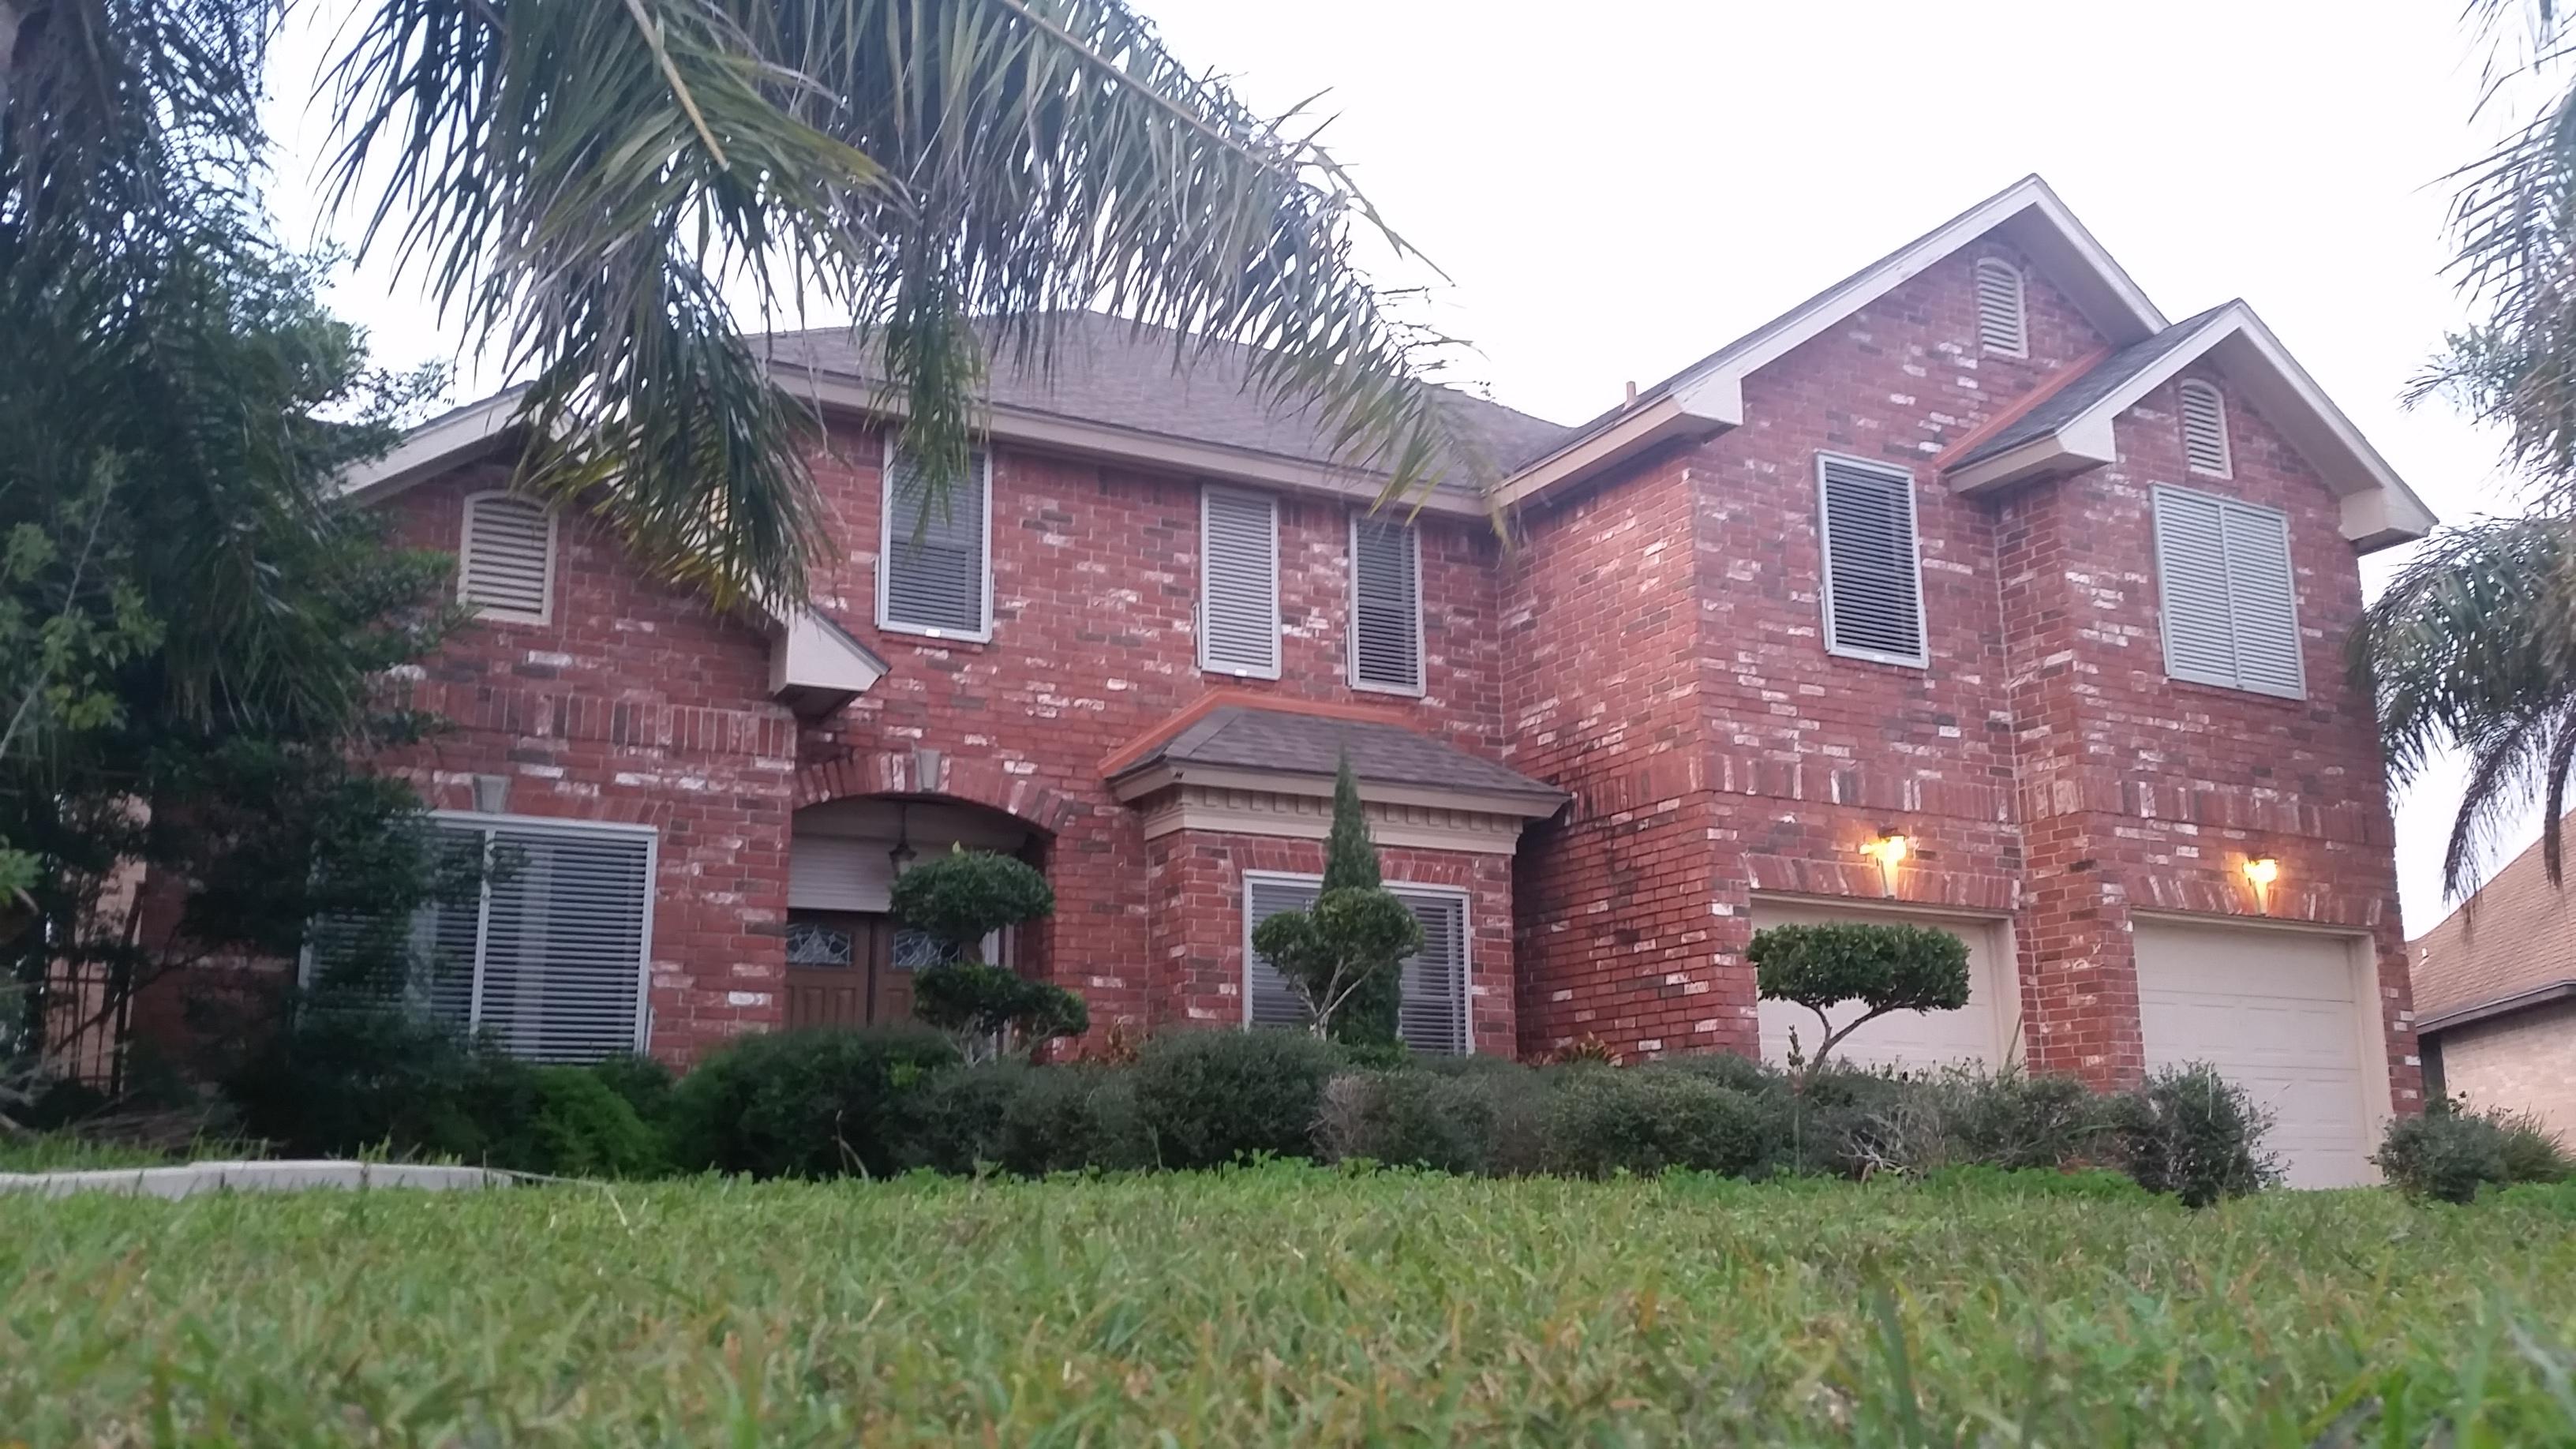 205 San Diego Ave Brownsville, Texas 78526